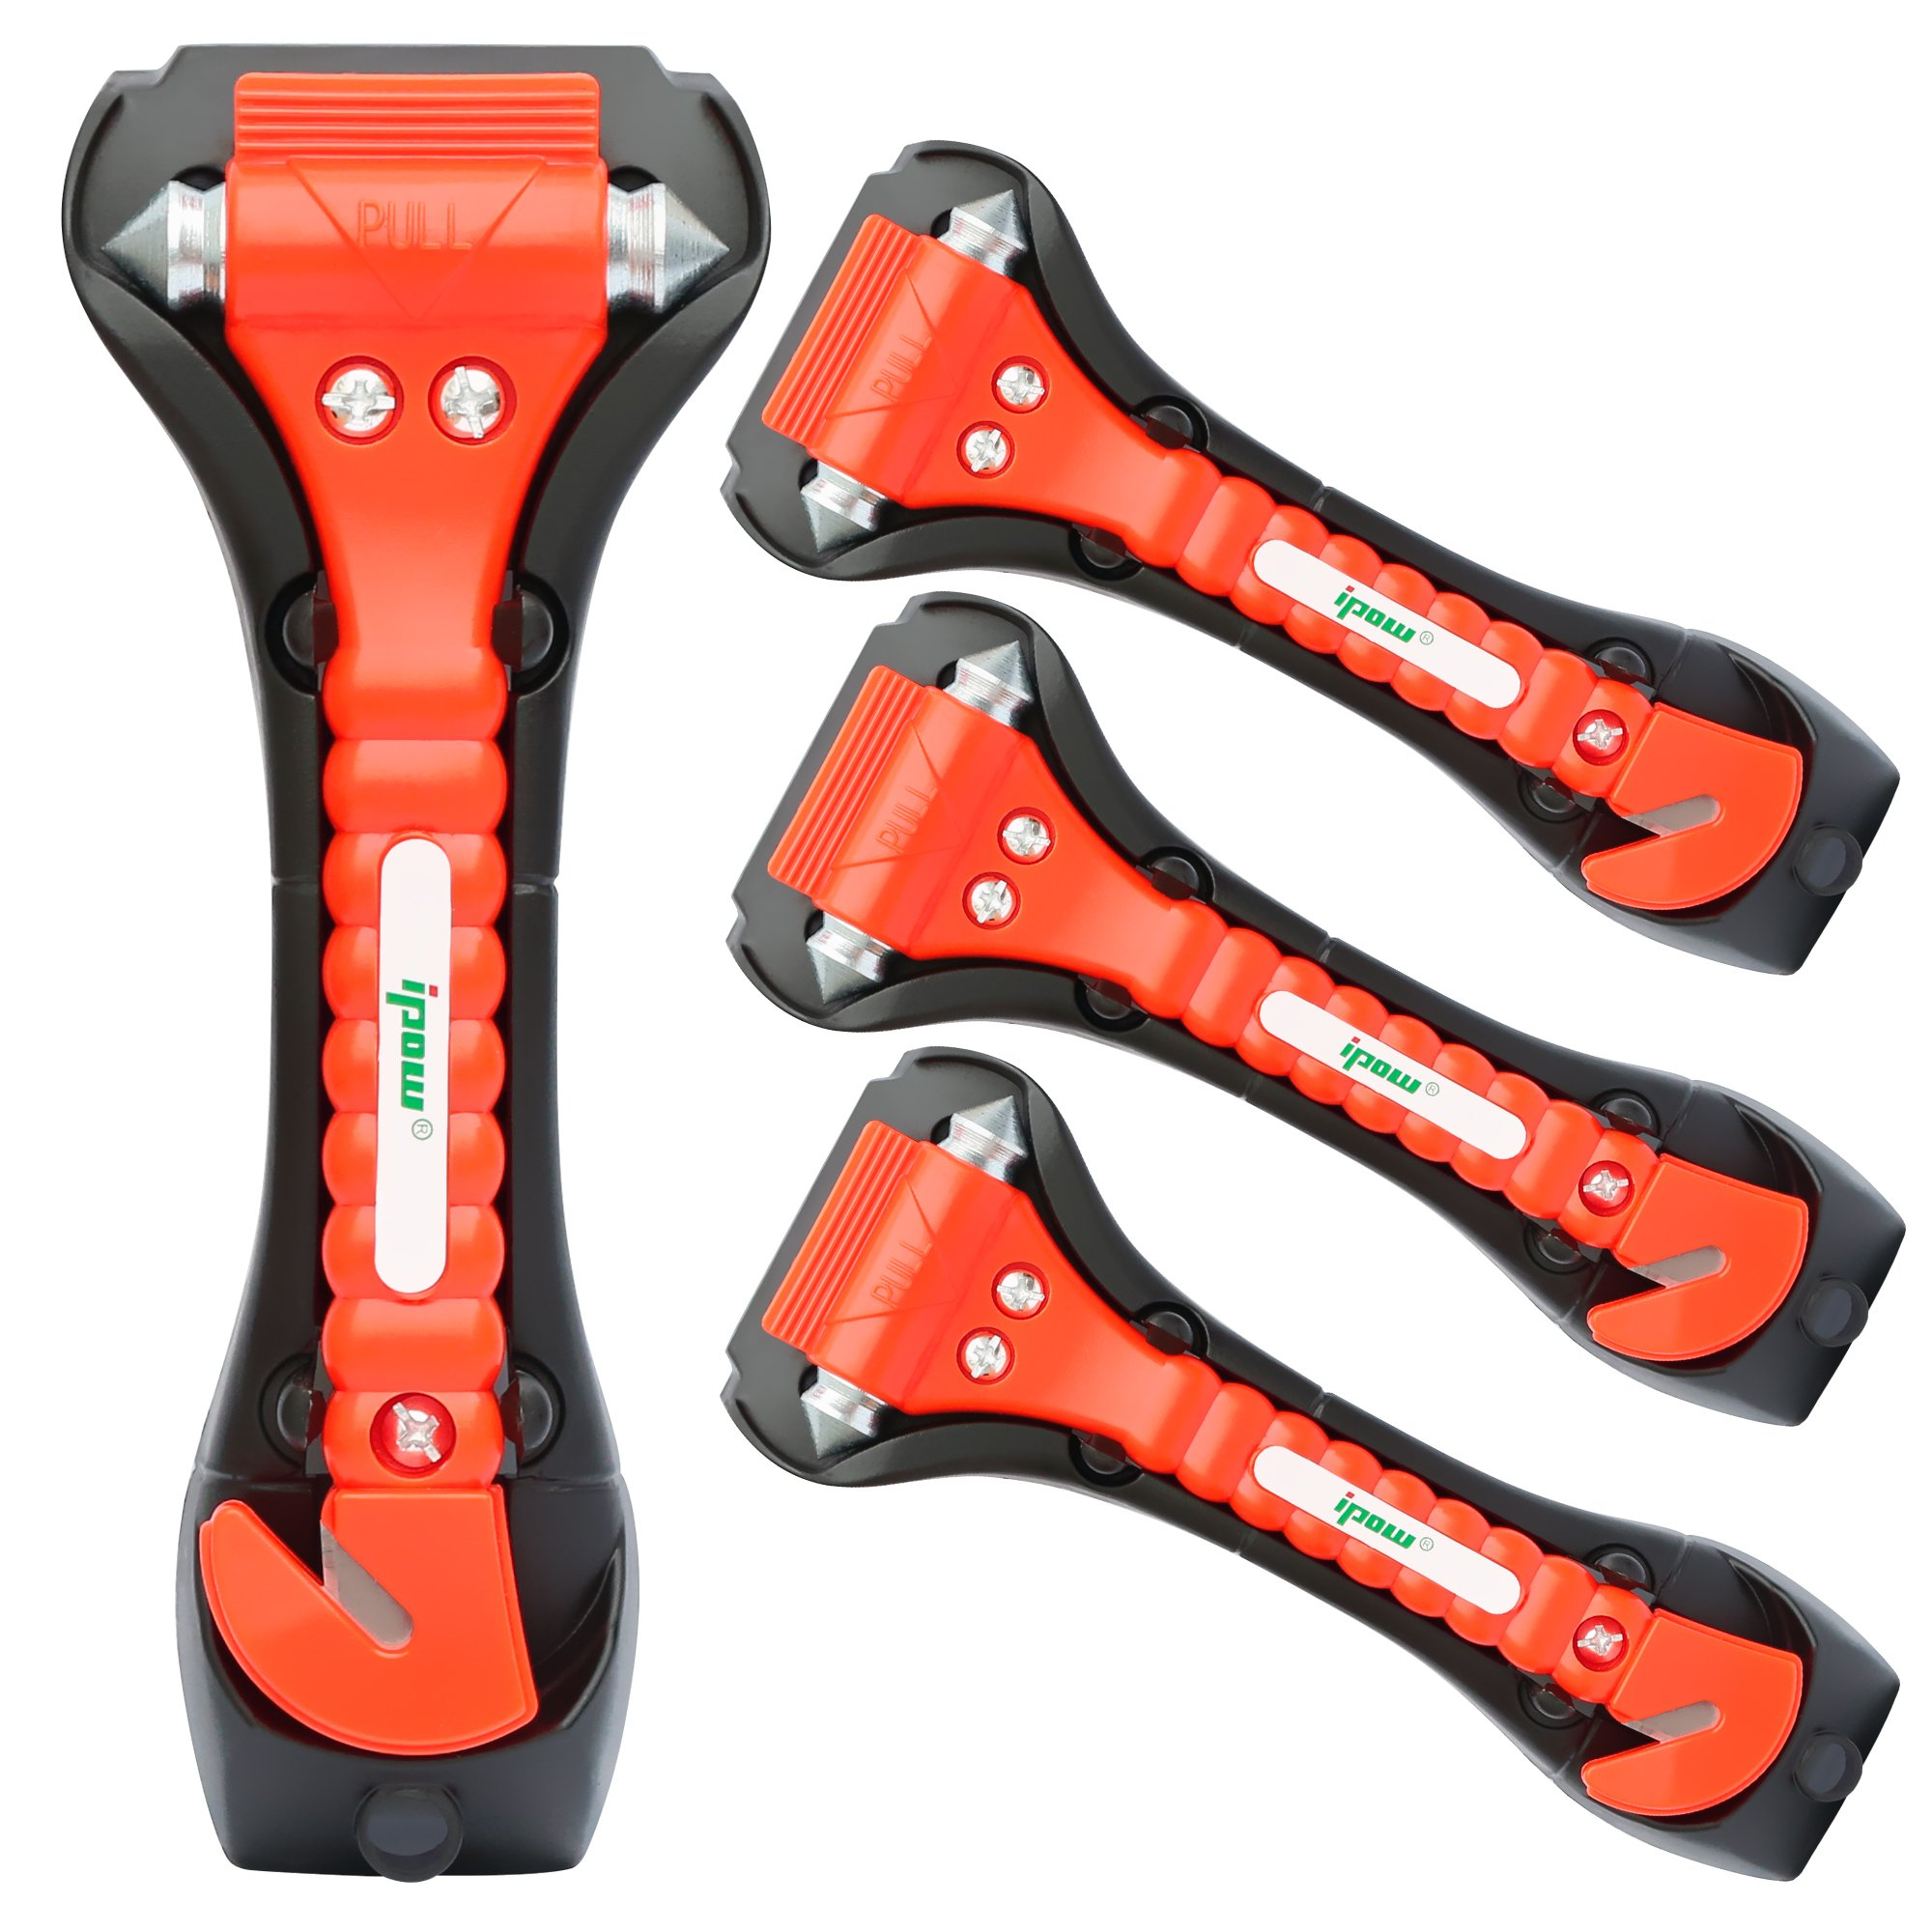 IPOW 4 PCS Car Safety Antiskid Hammer Seatbelt Cutter Emergency Class/Window Punch Breaker Auto Rescue Disaster Escape Life-Saving Hammer Tool,Big